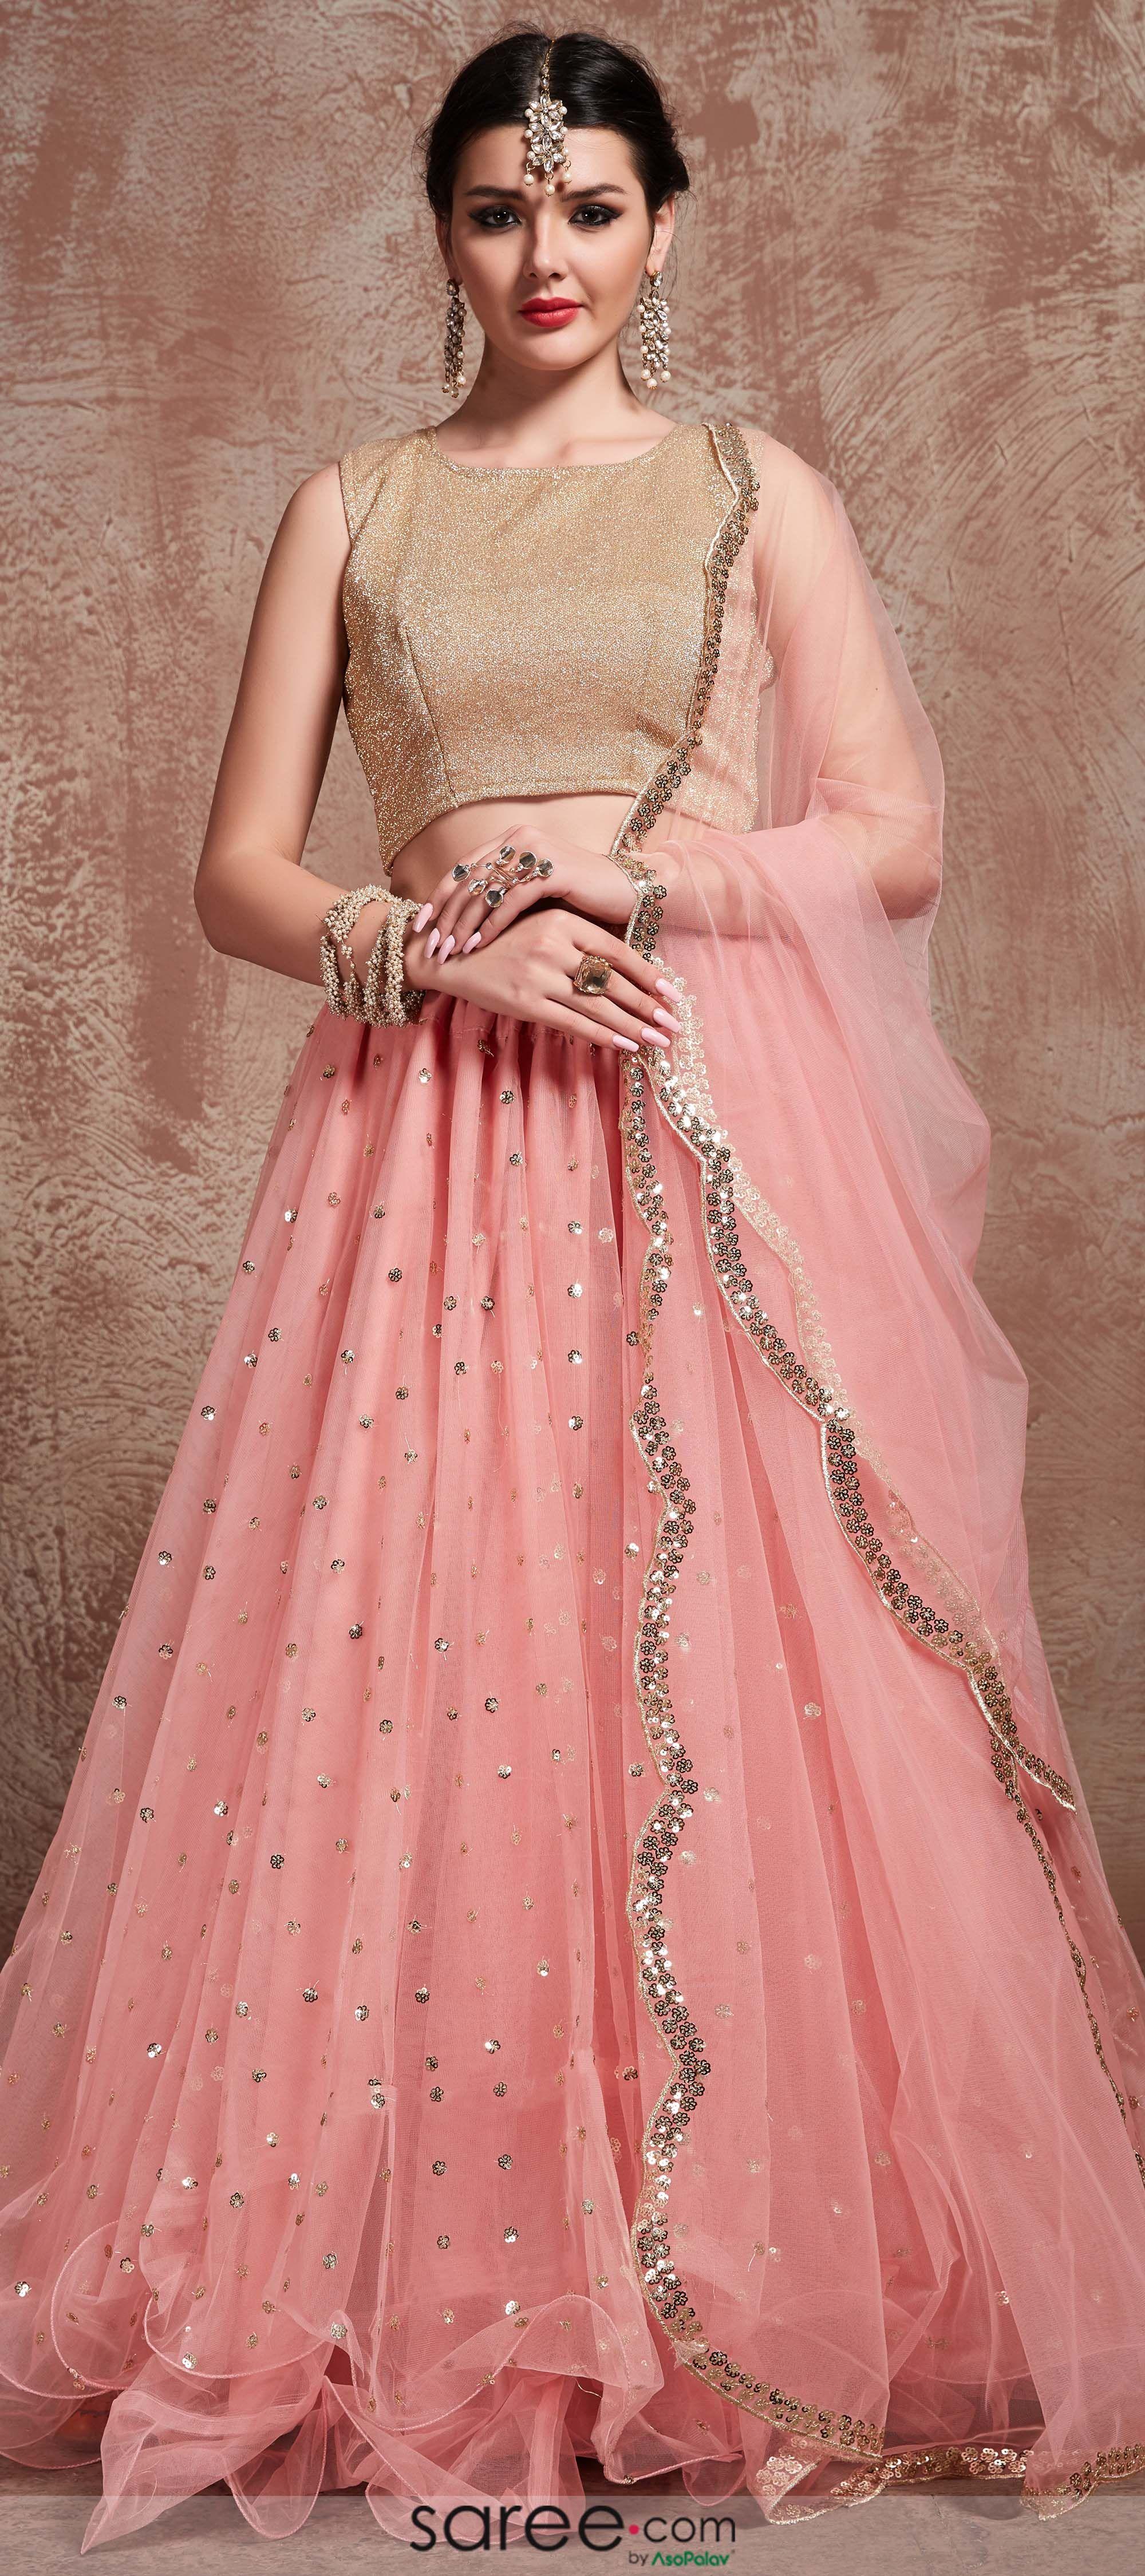 bridal wedding outfit wardrobe lehenga choli Taffeta Silk Evening Party Wear Lehenga Choli for Australia bridal online shopping